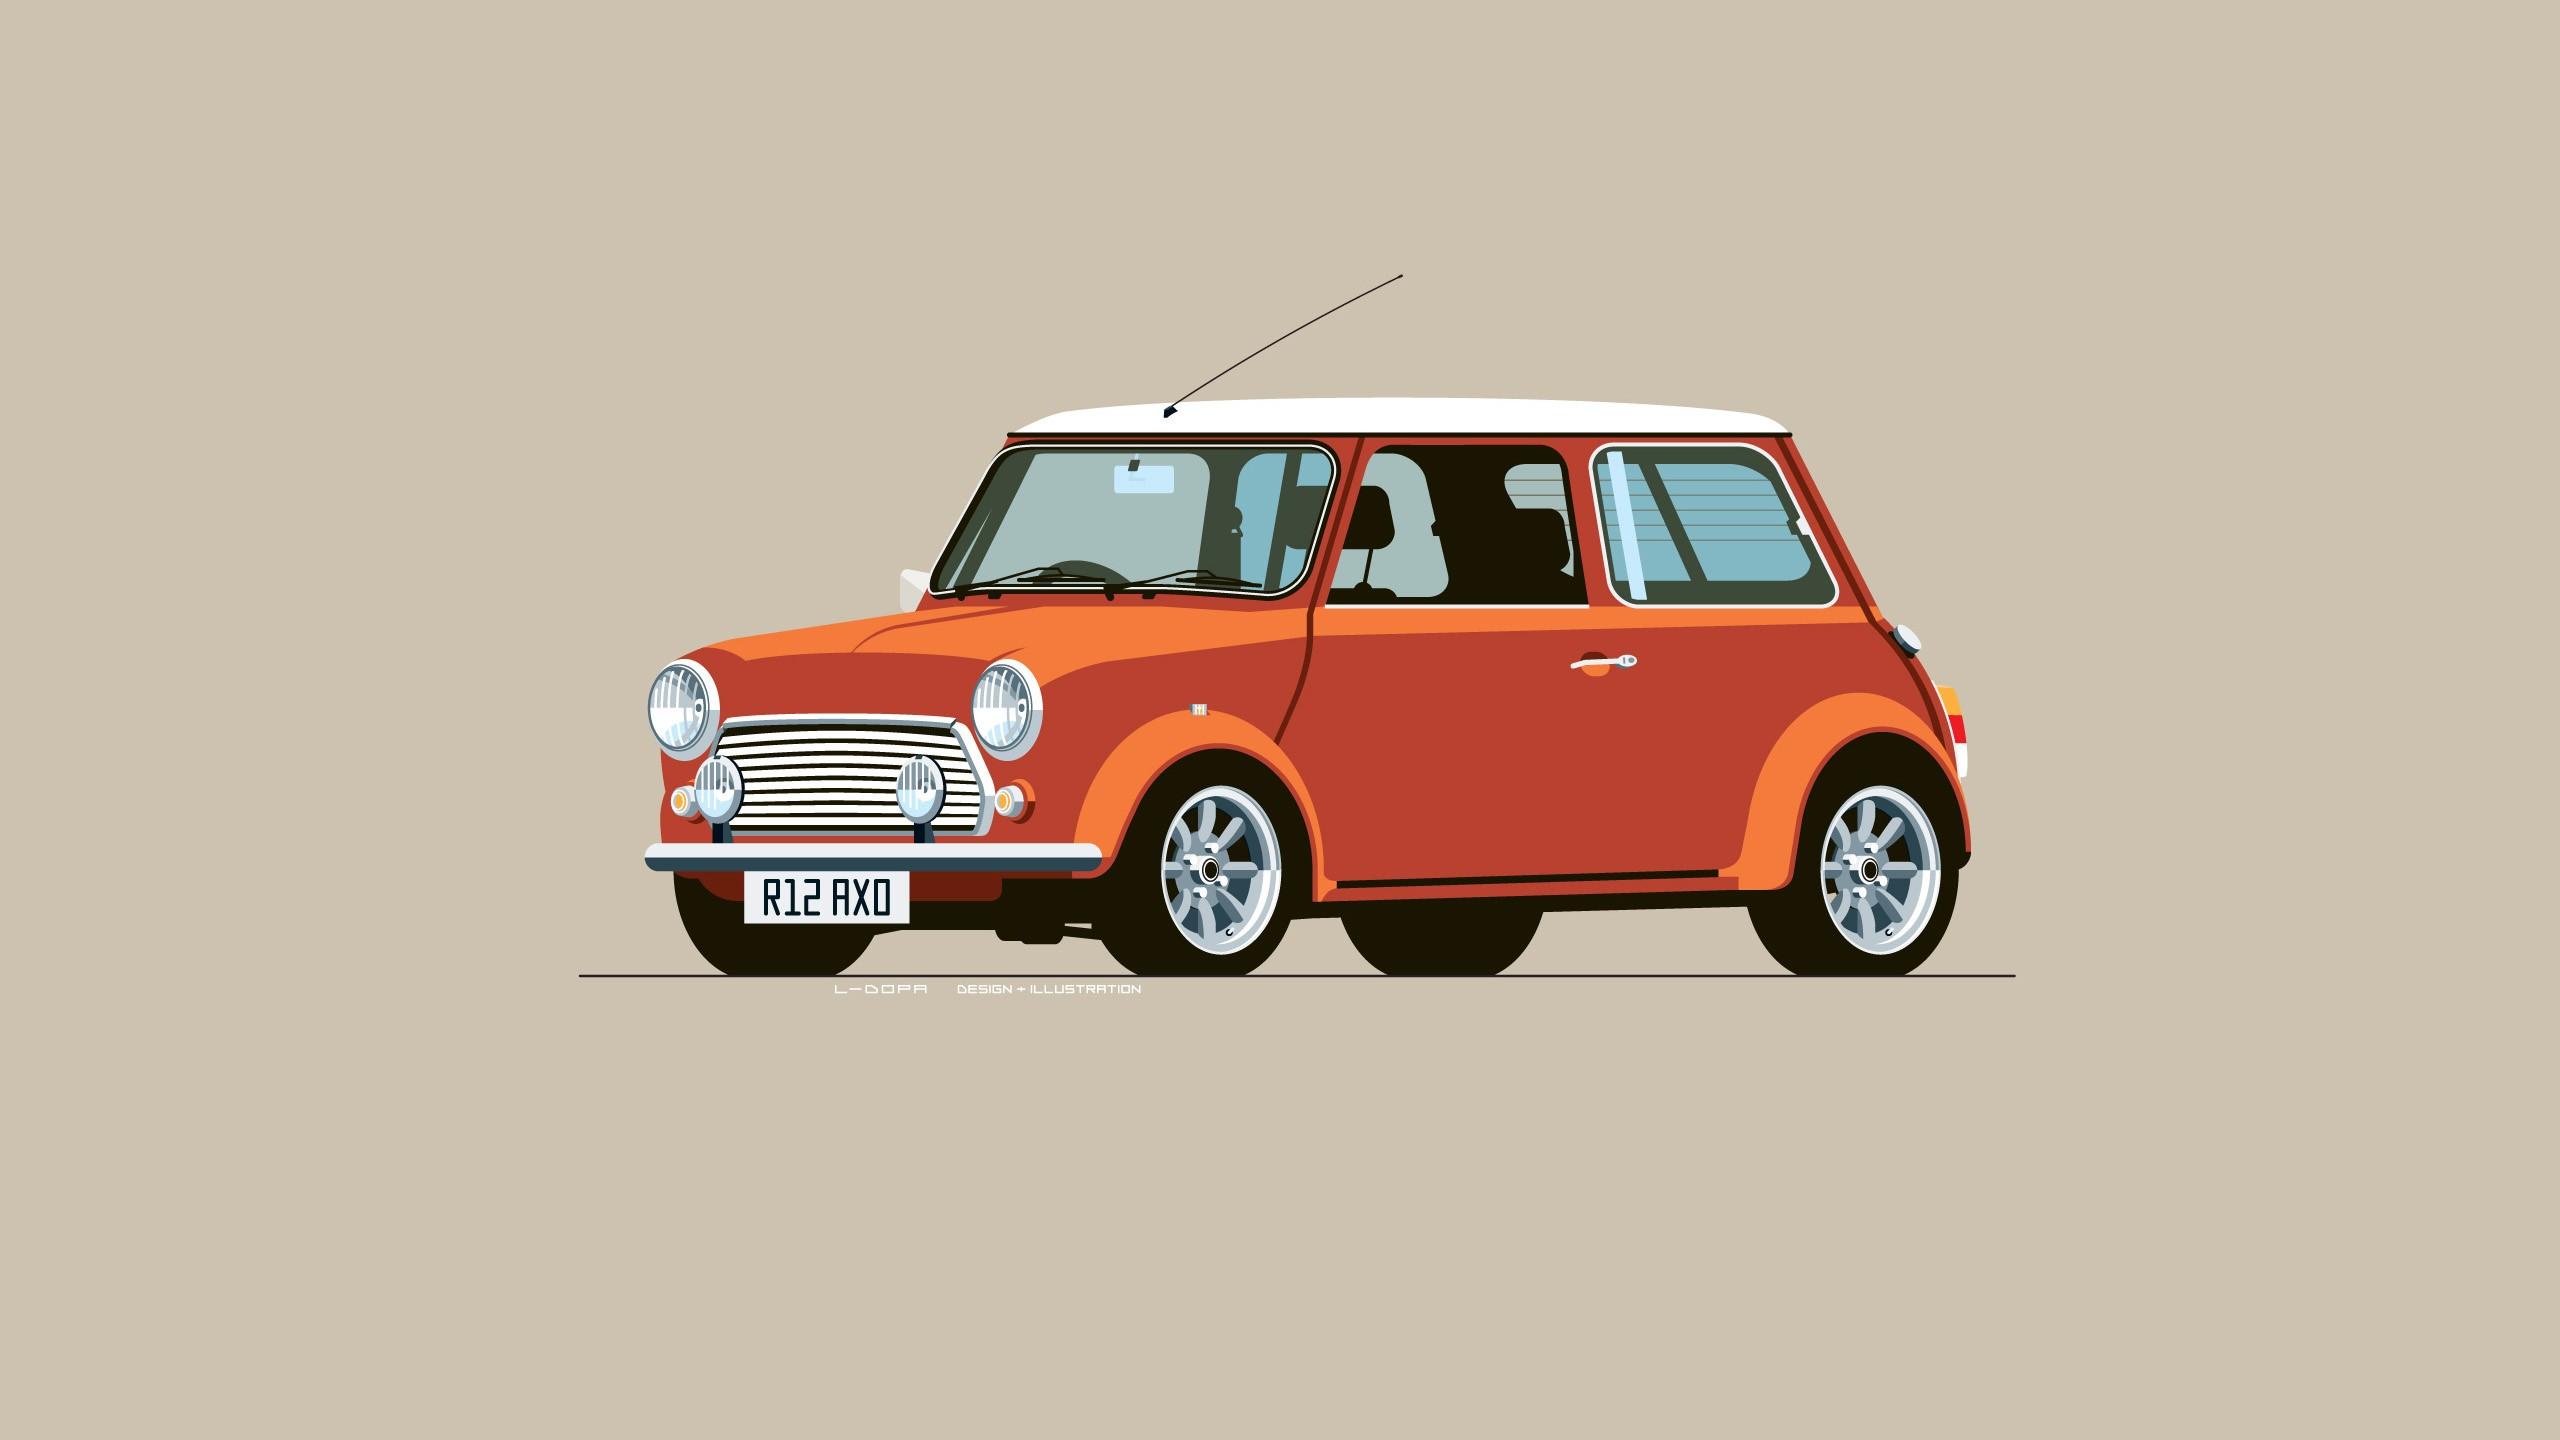 Wallpaper Digital Art Simple Background Minimalism Red Cars